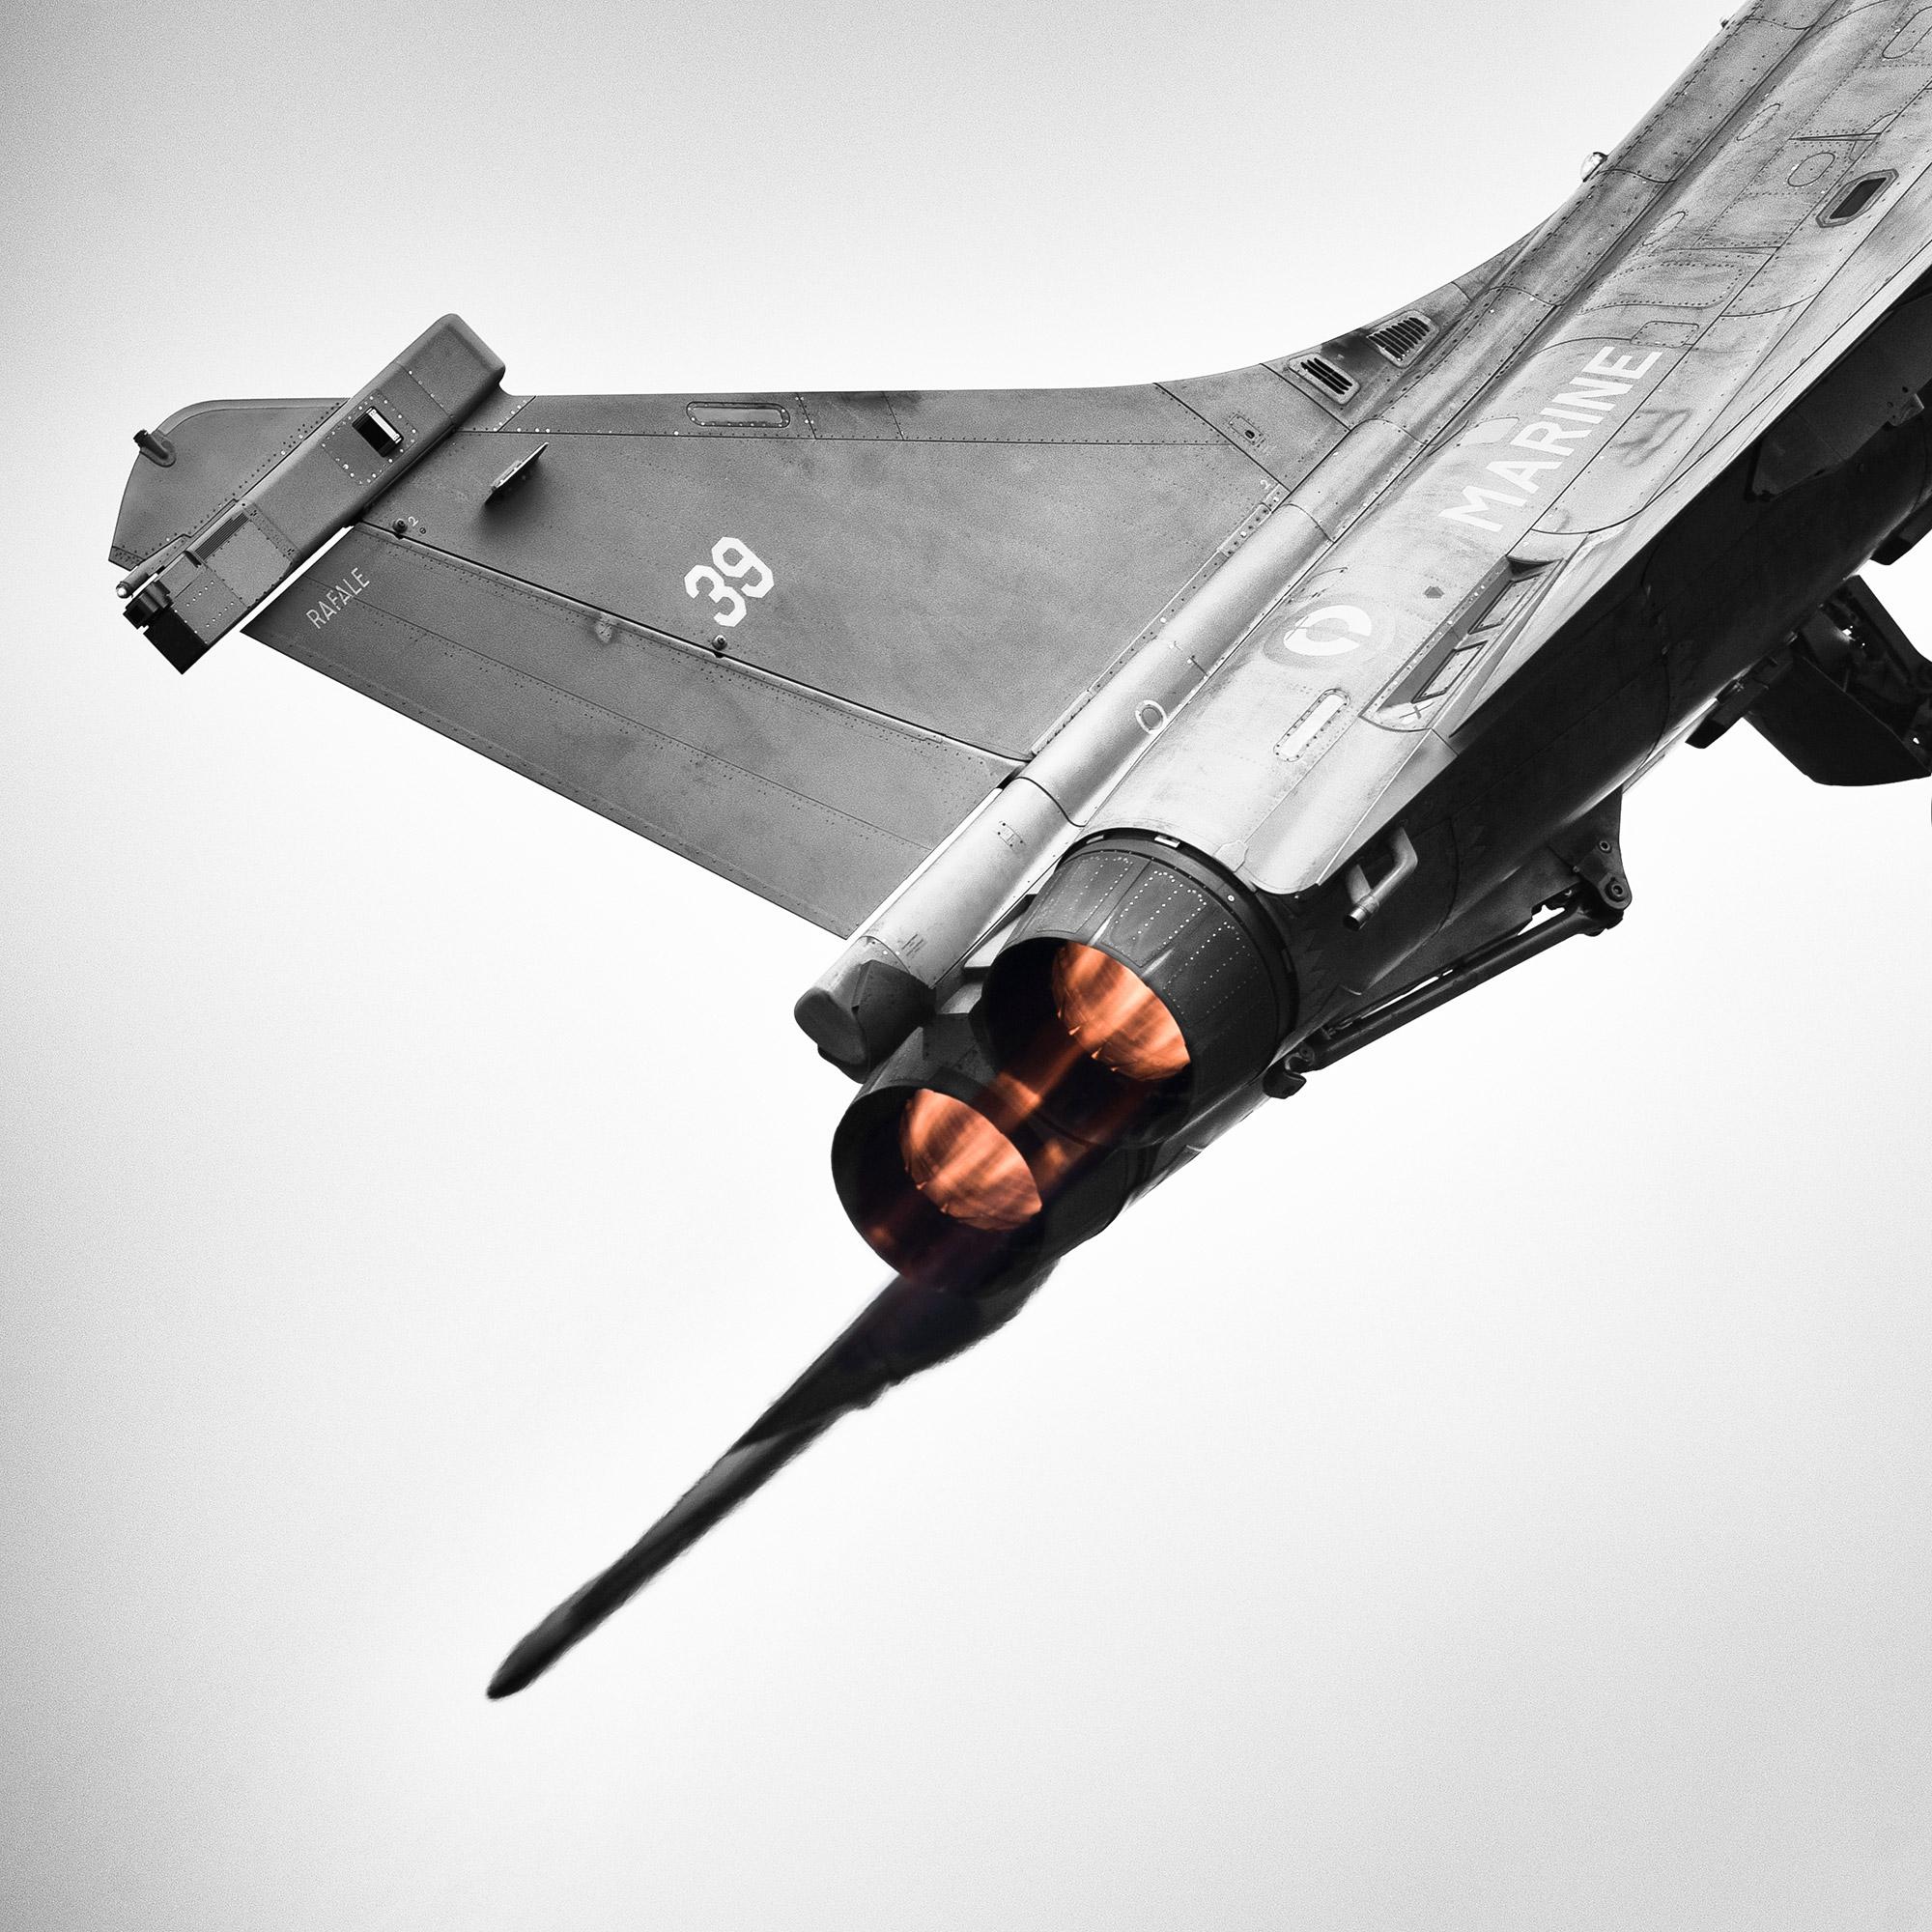 photographie-avion-matiere-6